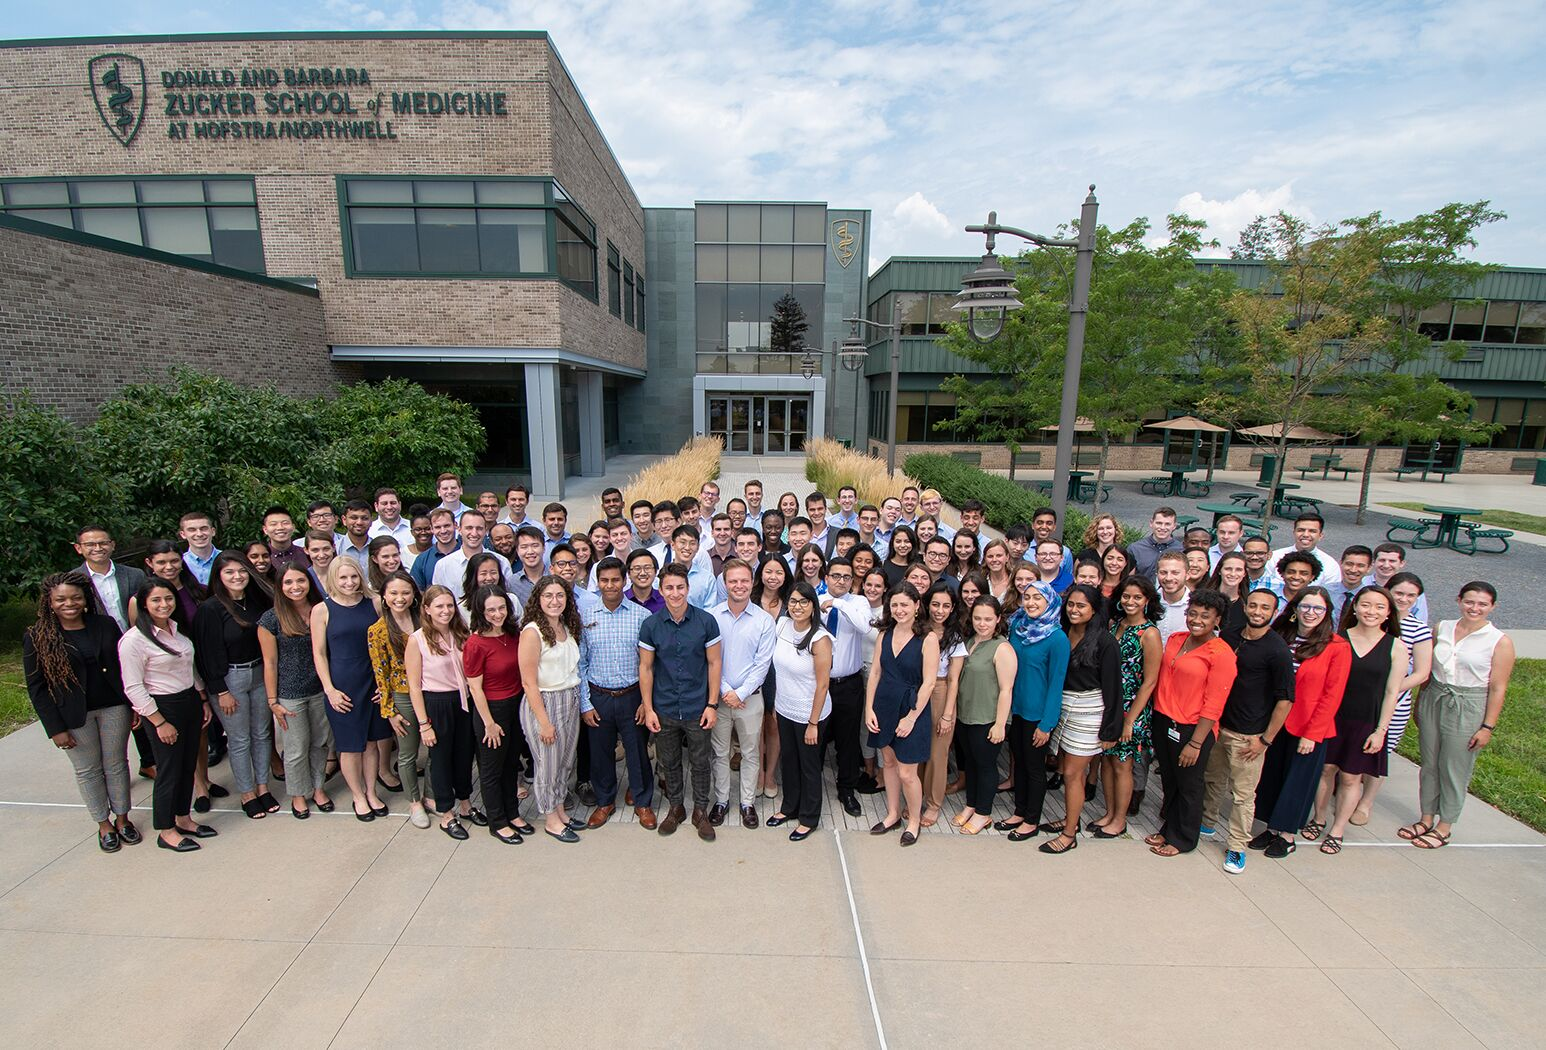 Zucker School of Medicine at Hofstra/Northwell first-year students.